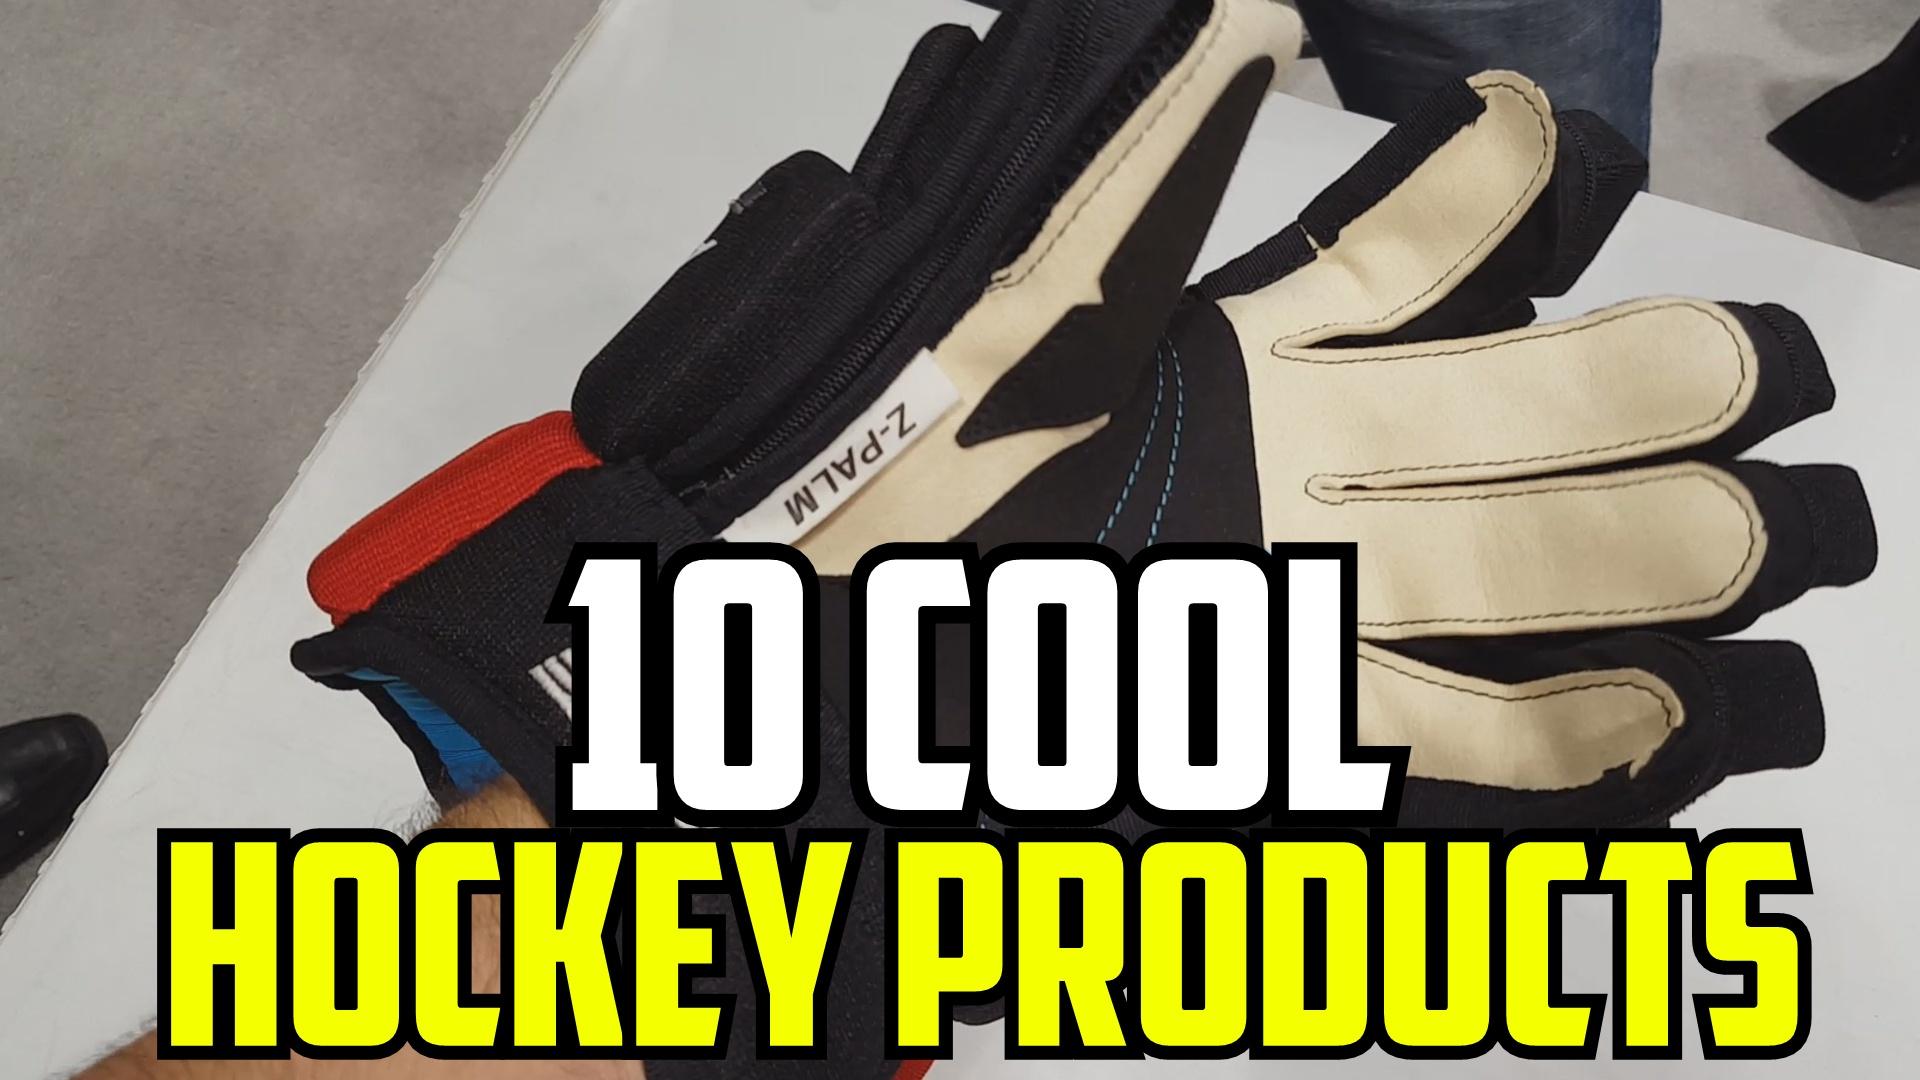 Hockey Goalie Training Drills